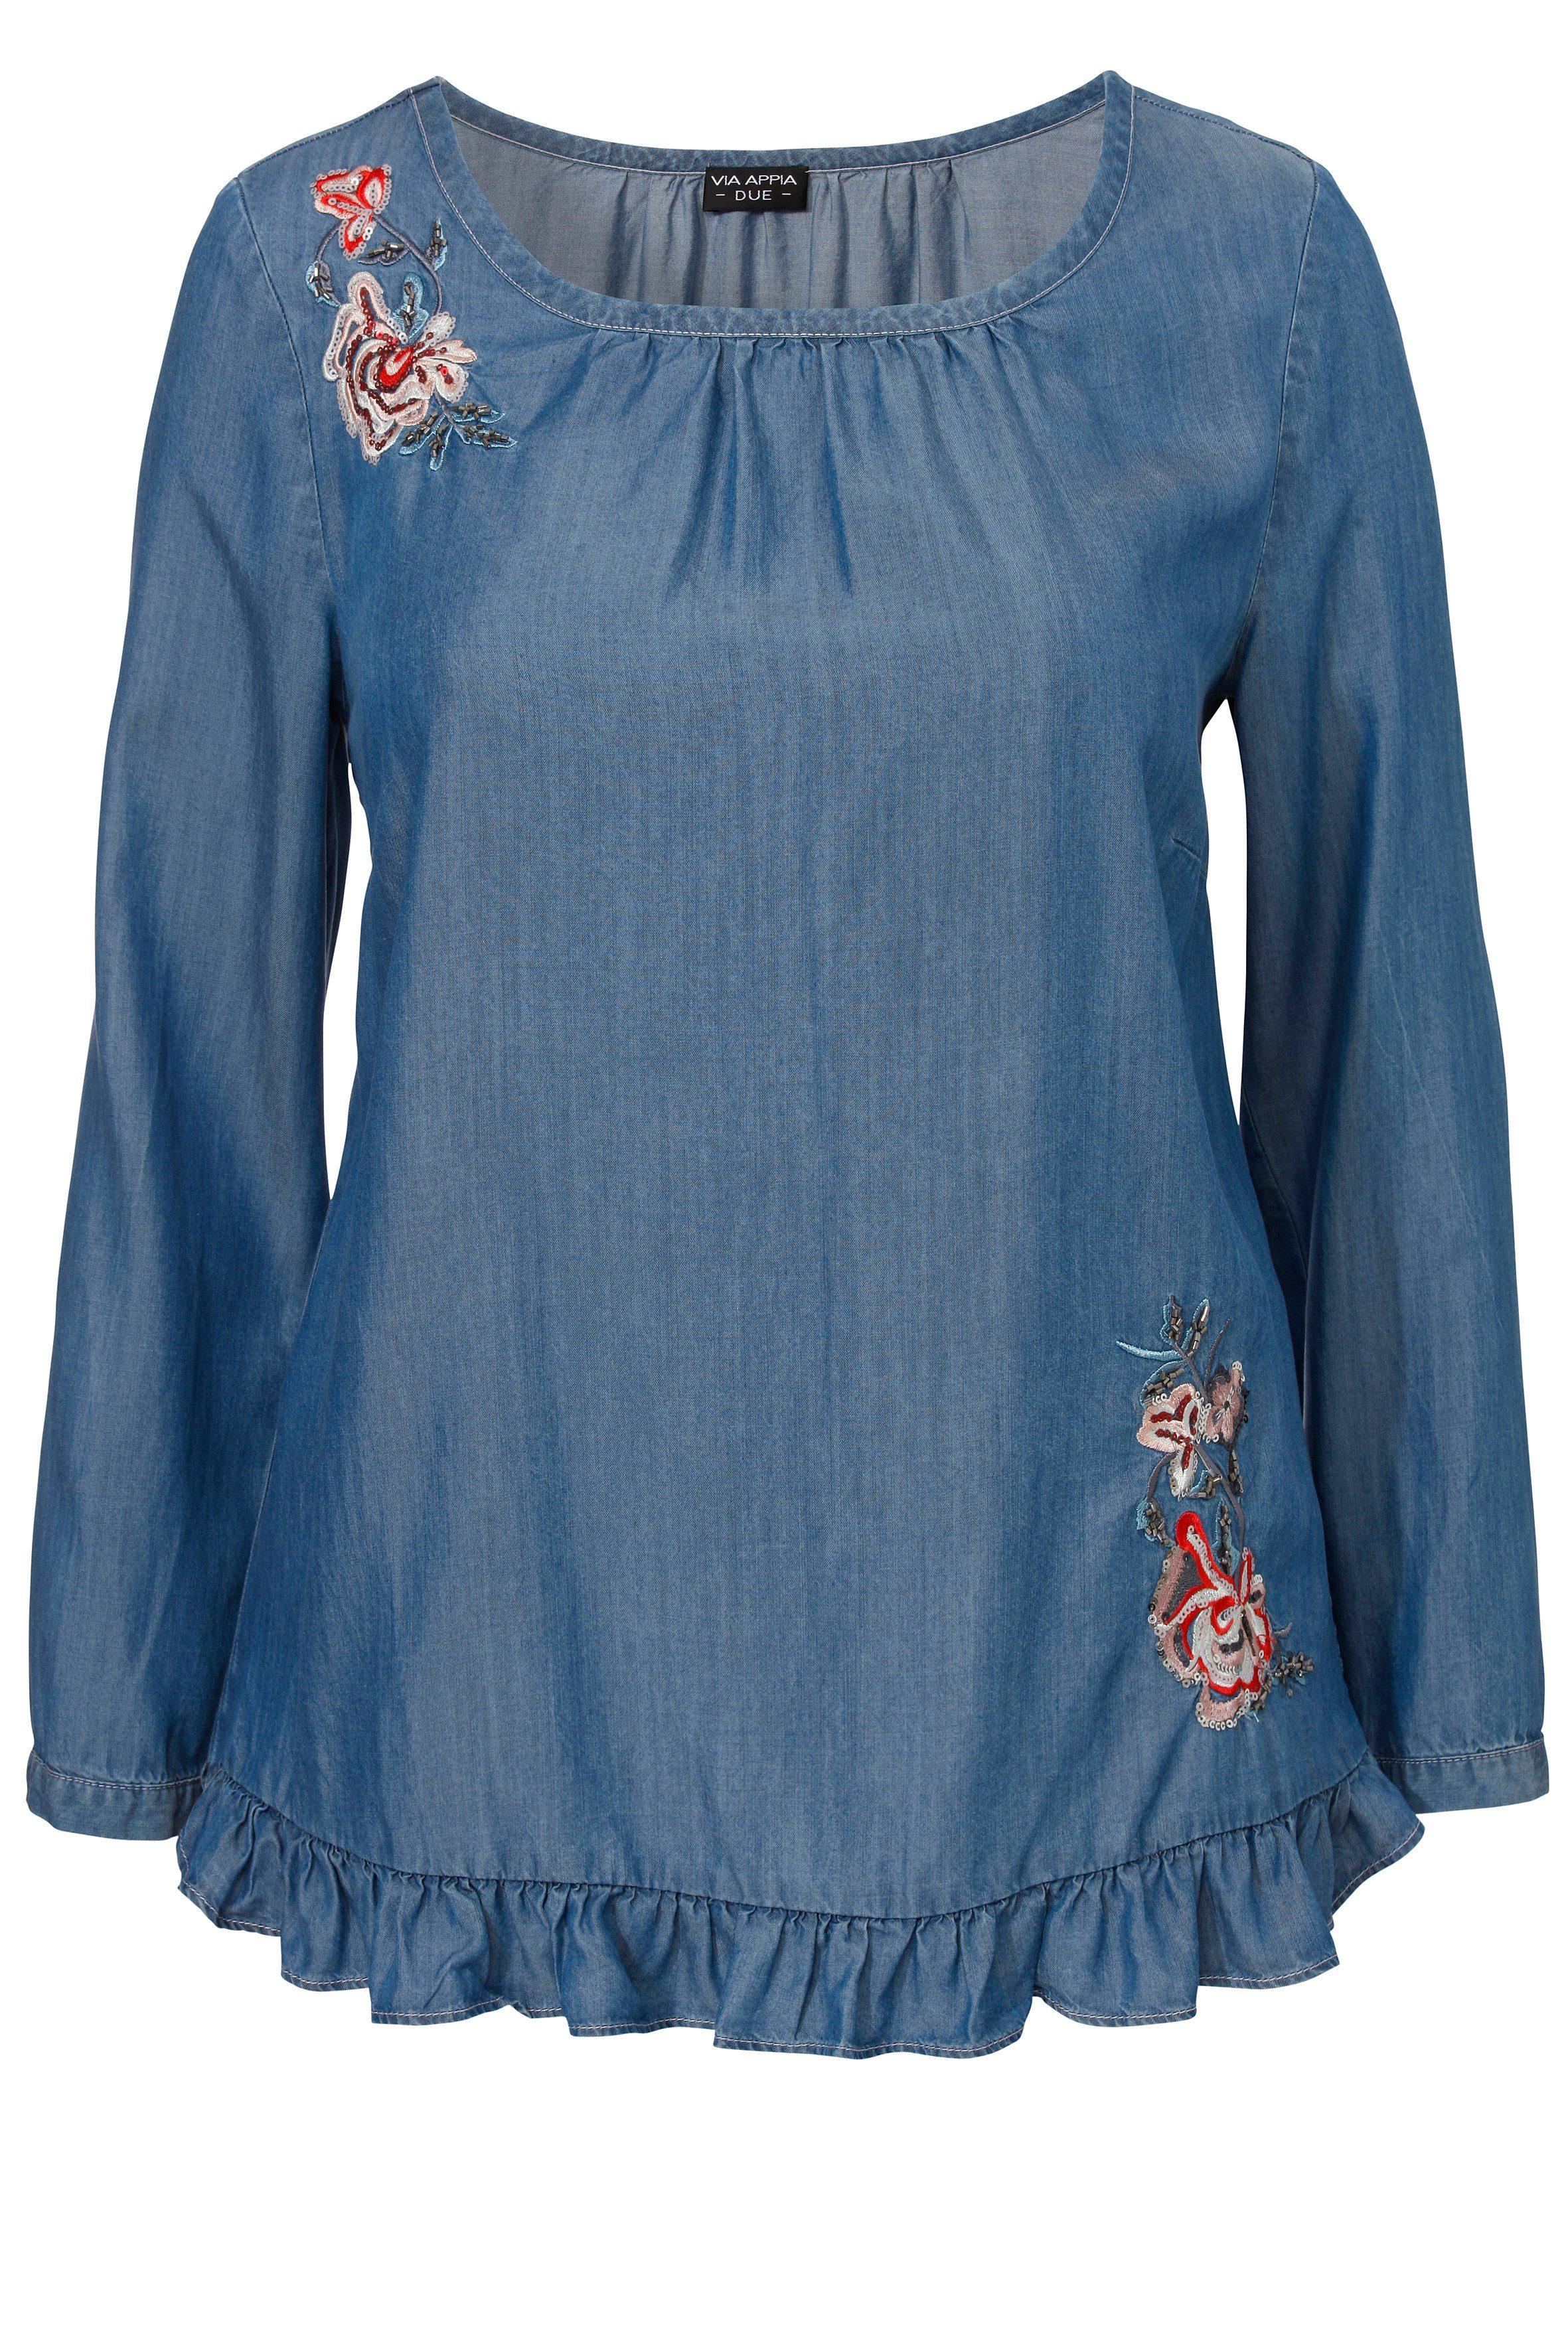 VIA APPIA DUE Bestickte Bluse mit Rüschenbordüre